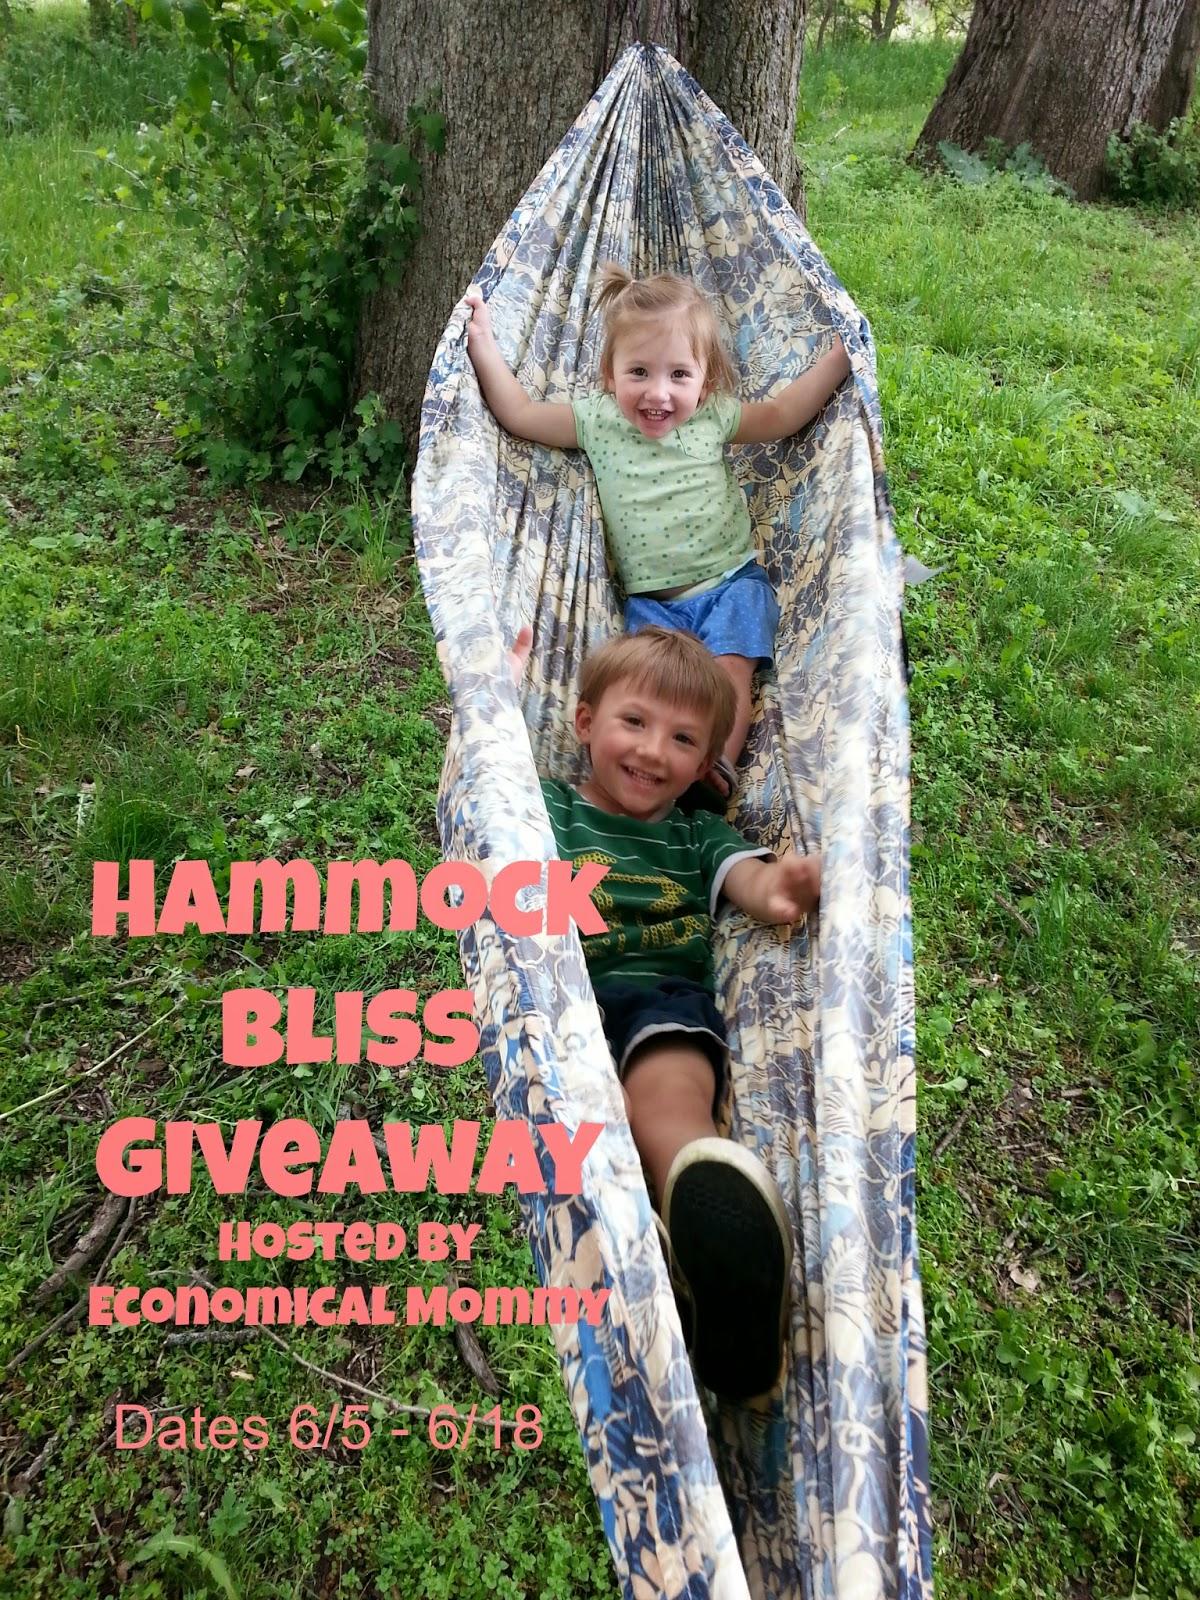 Hammock Bliss Giveaway